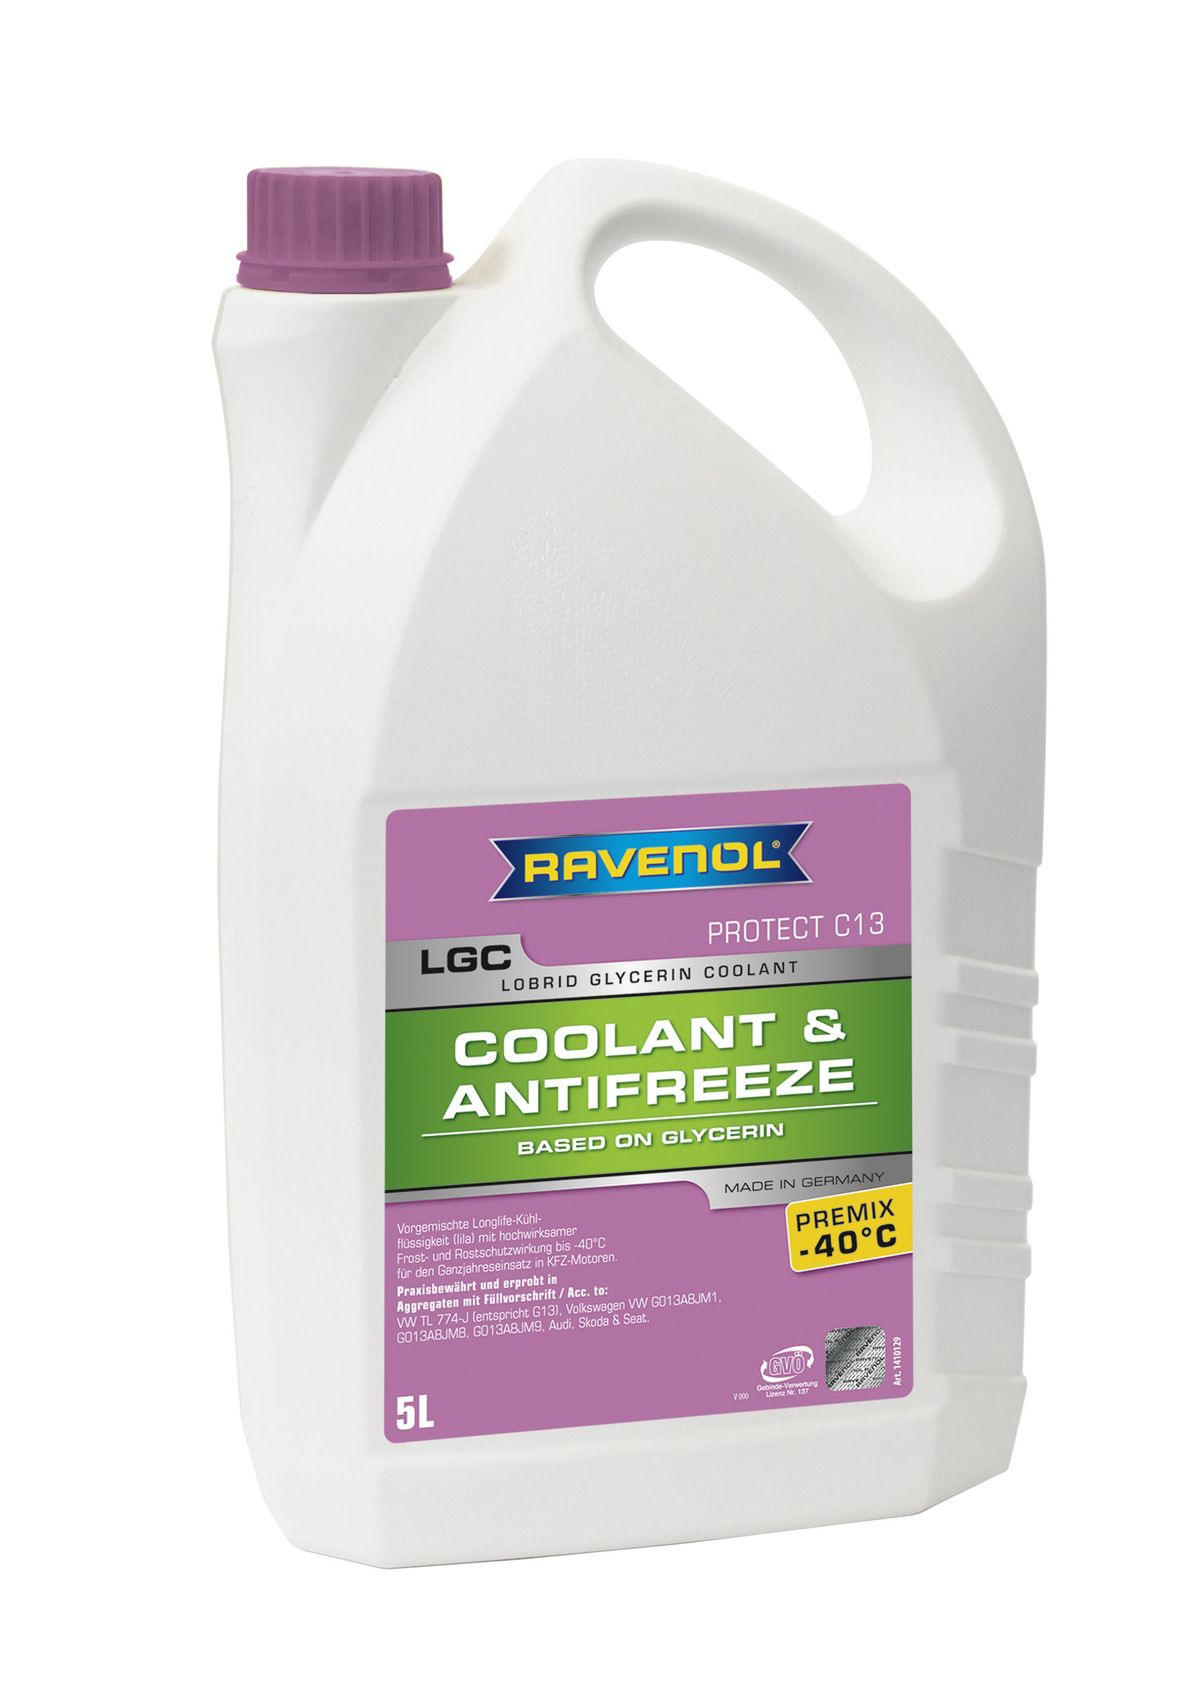 Антифриз Ravenol лиловый LGC Lobrid Glycerin Coolant Premix -40° C13 ( 5 л) от Ravta